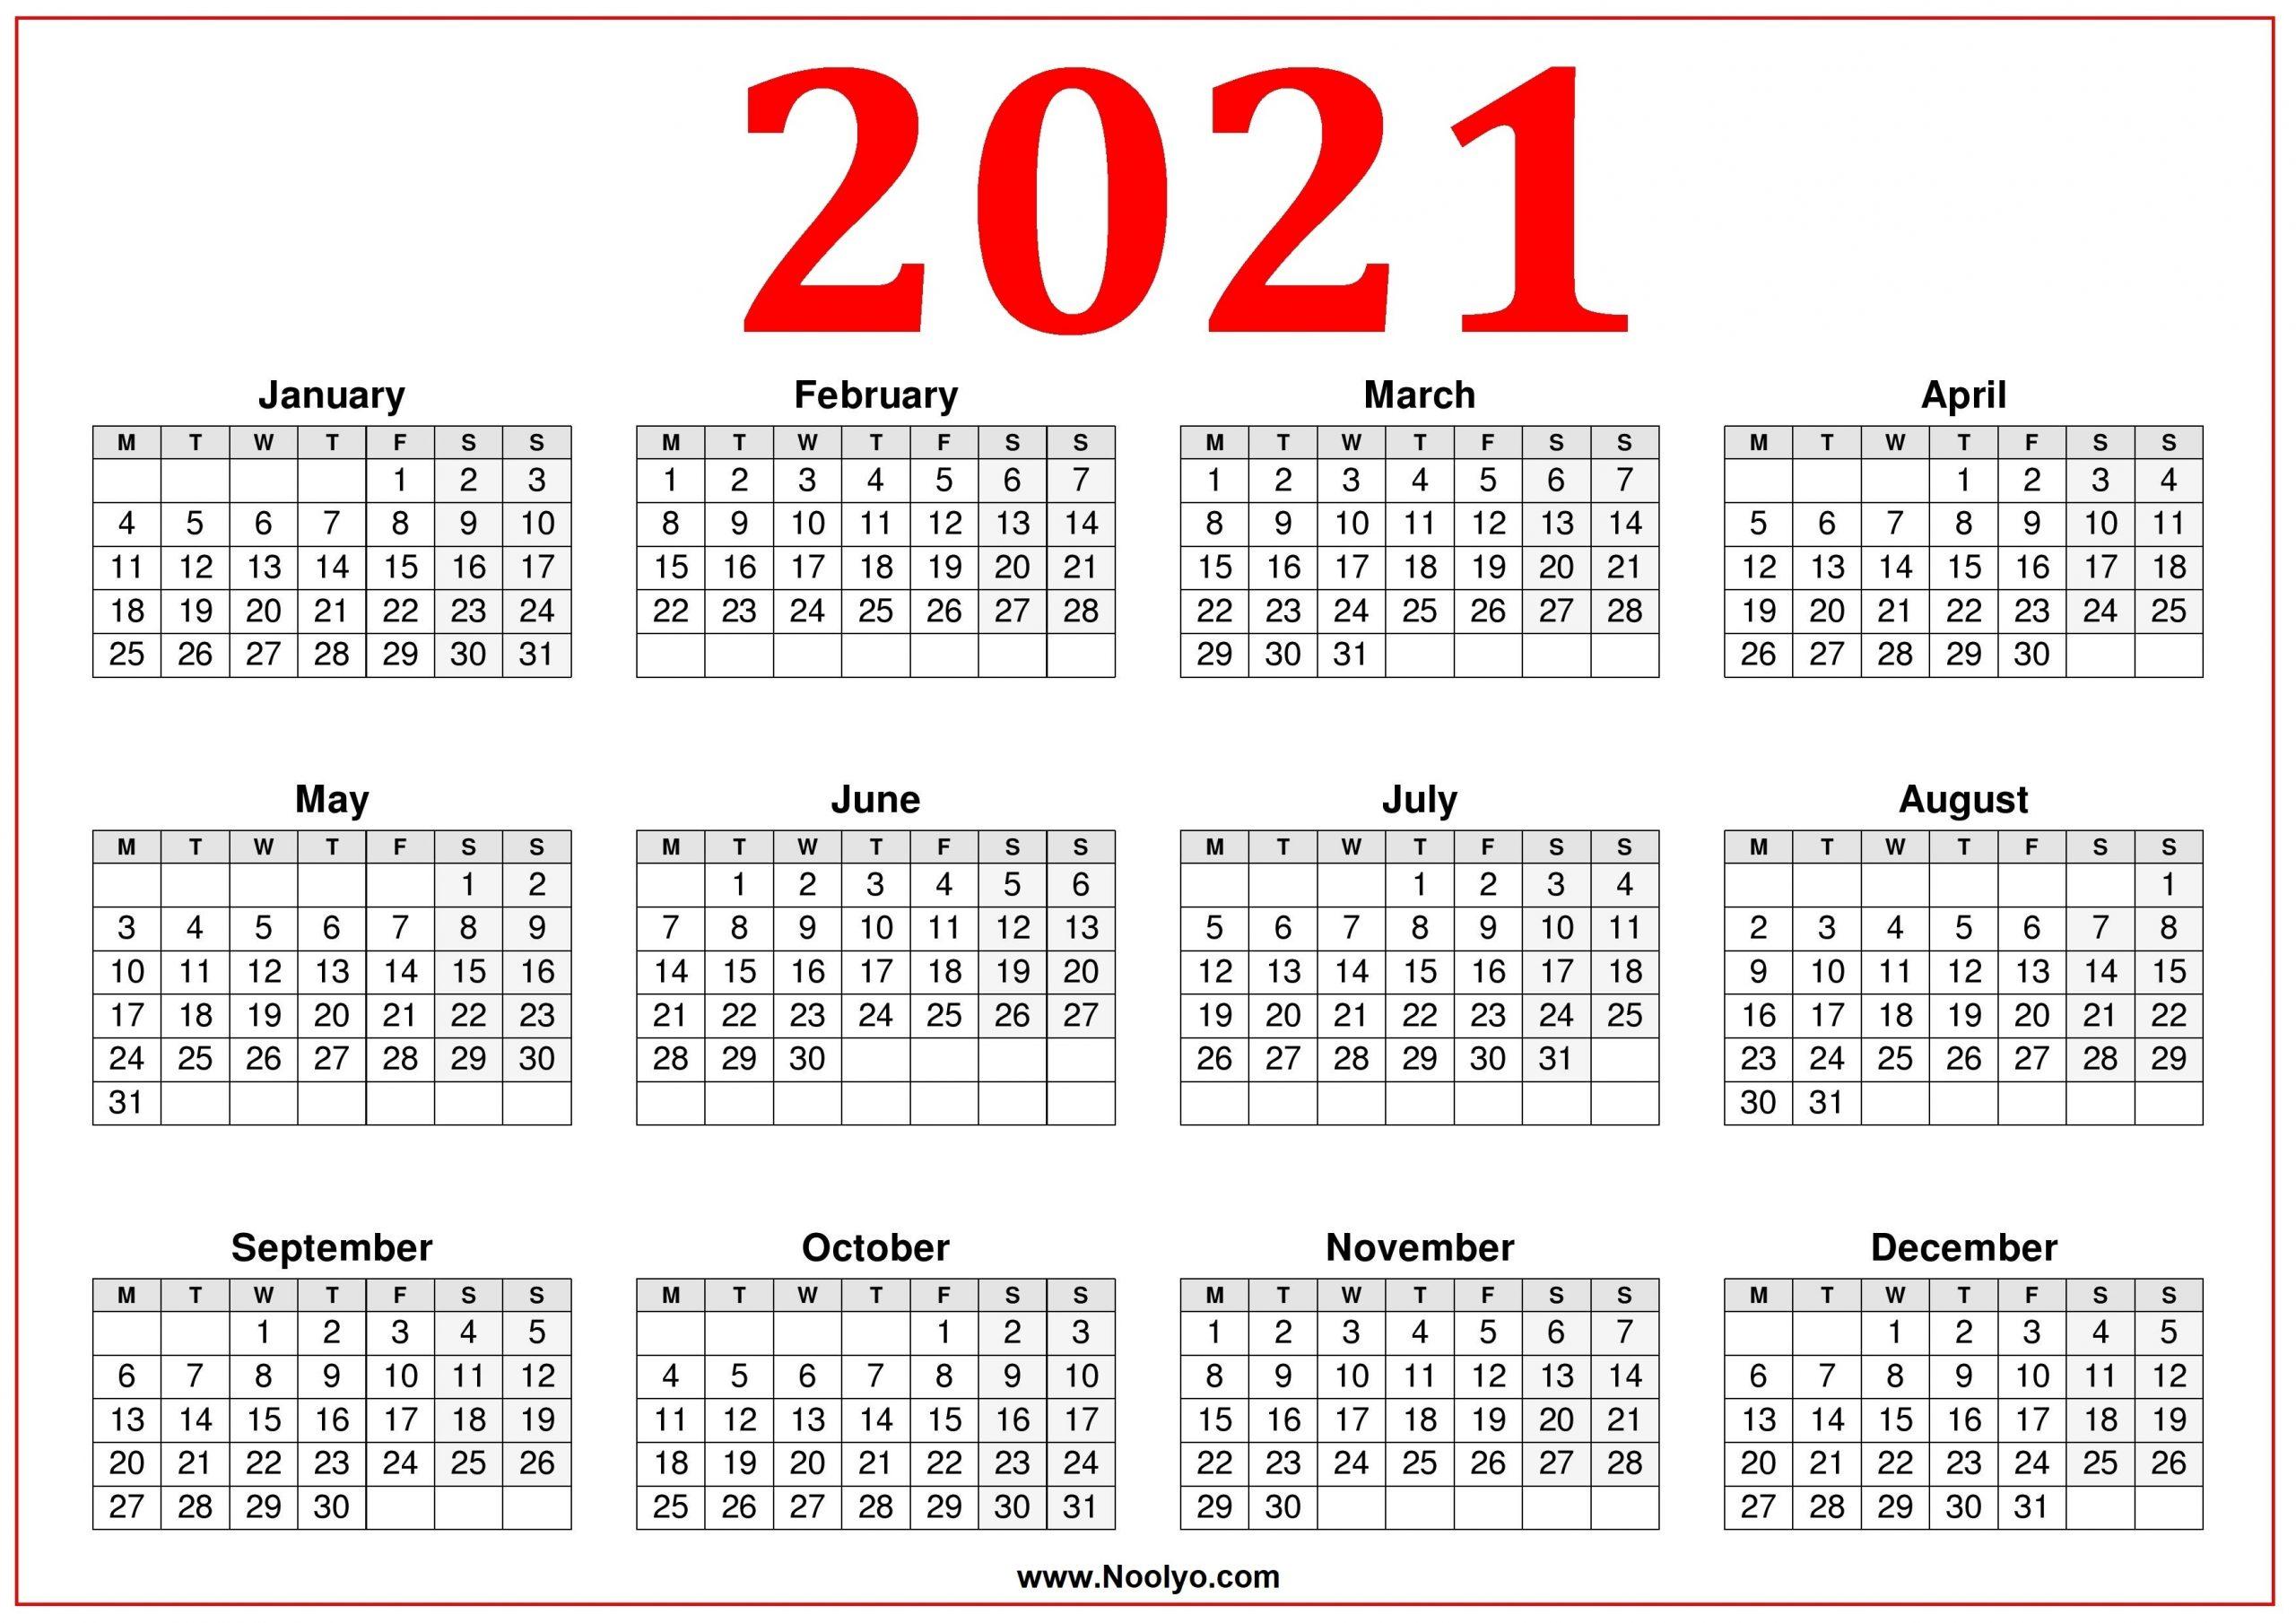 Catch 2021 Calendar Weeks Start On Monday